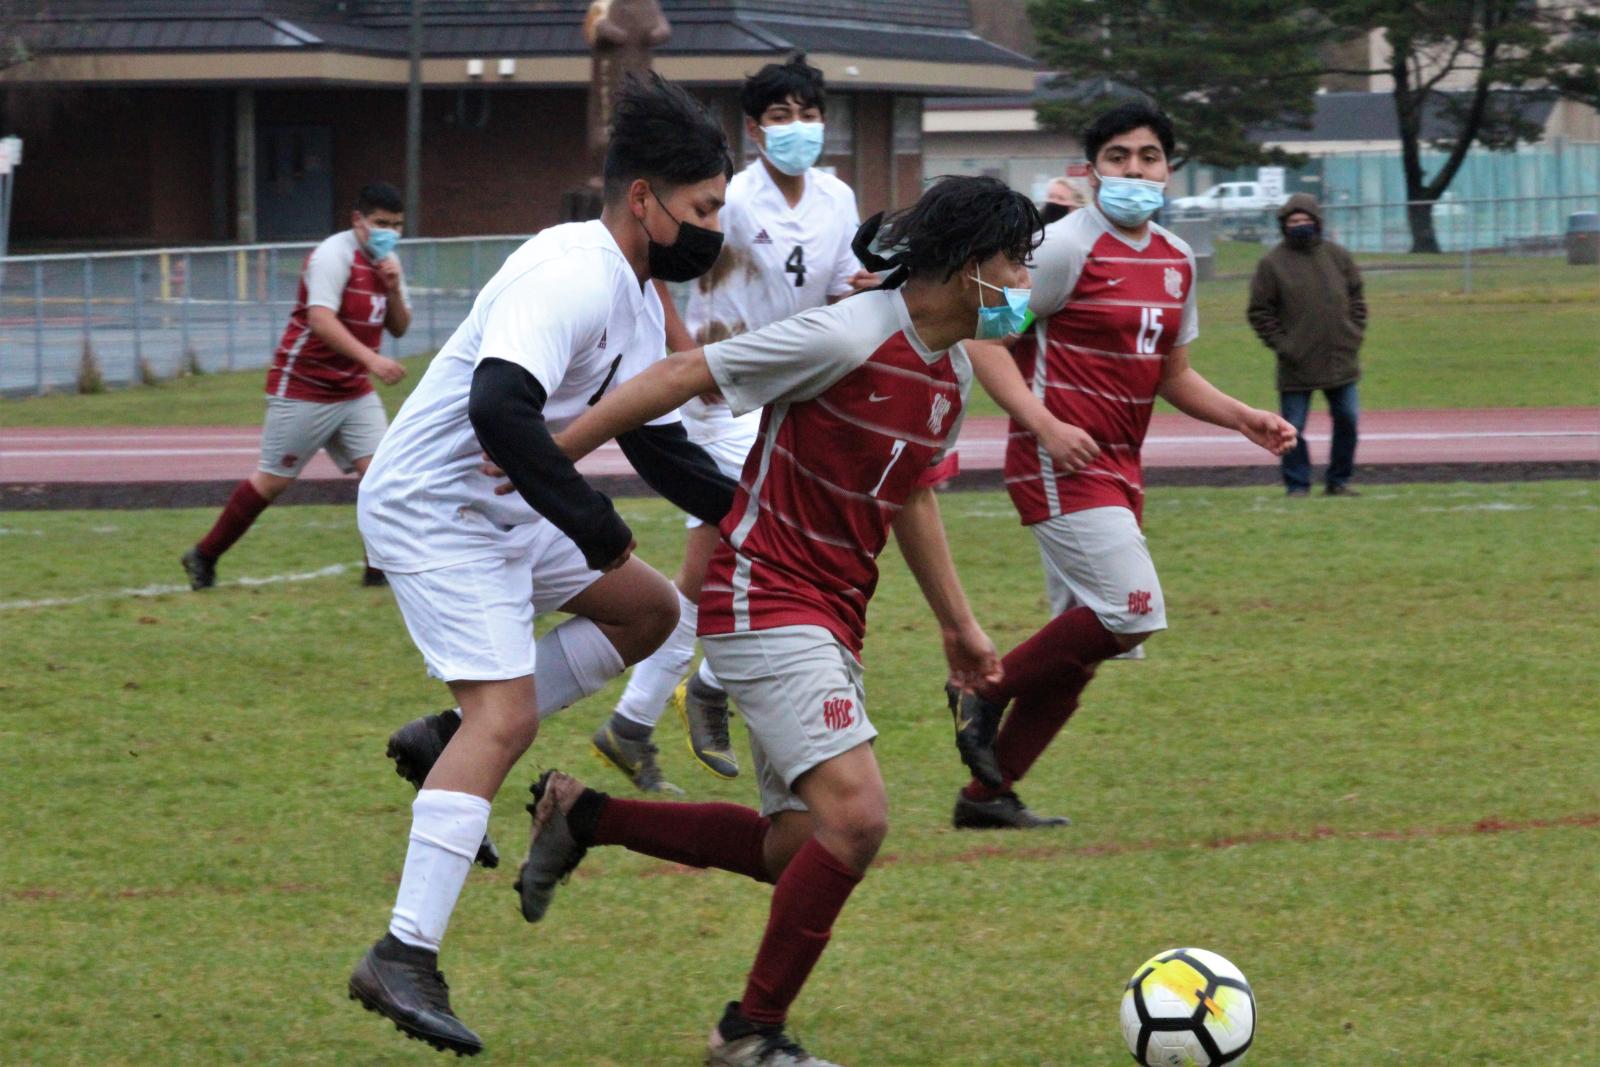 Hoquiam v. Raymond Varsity Boys Soccer 3/24/21 8-0 Win – Photos By Ben Winkelman (Team Pics by Coaches)